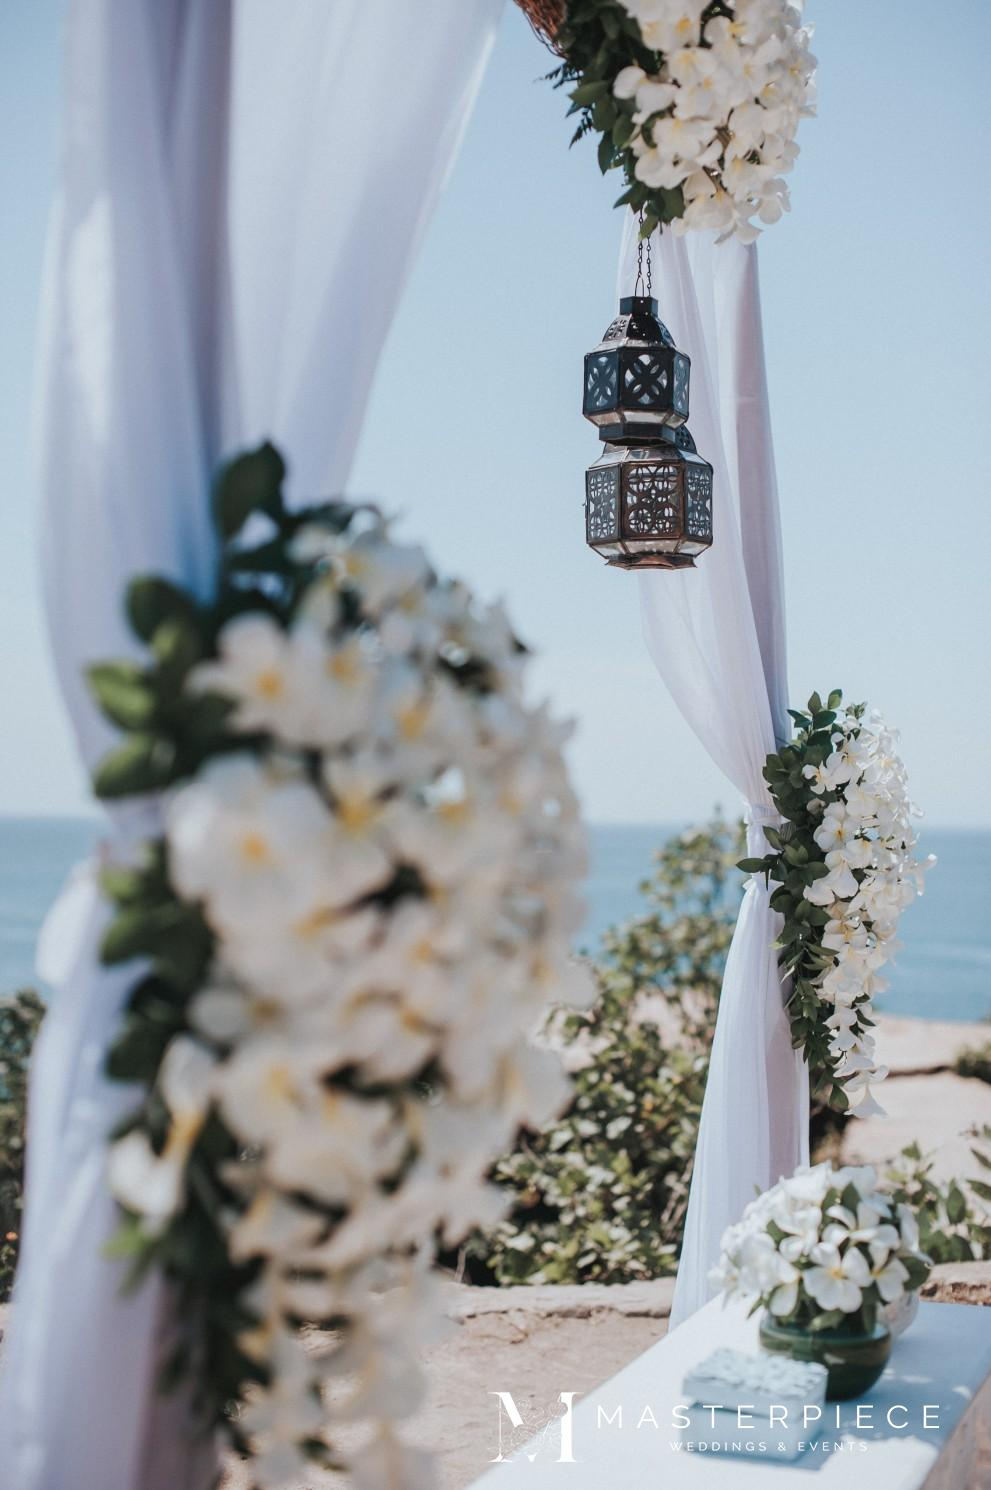 Masterpiece_Weddings_sluby_021